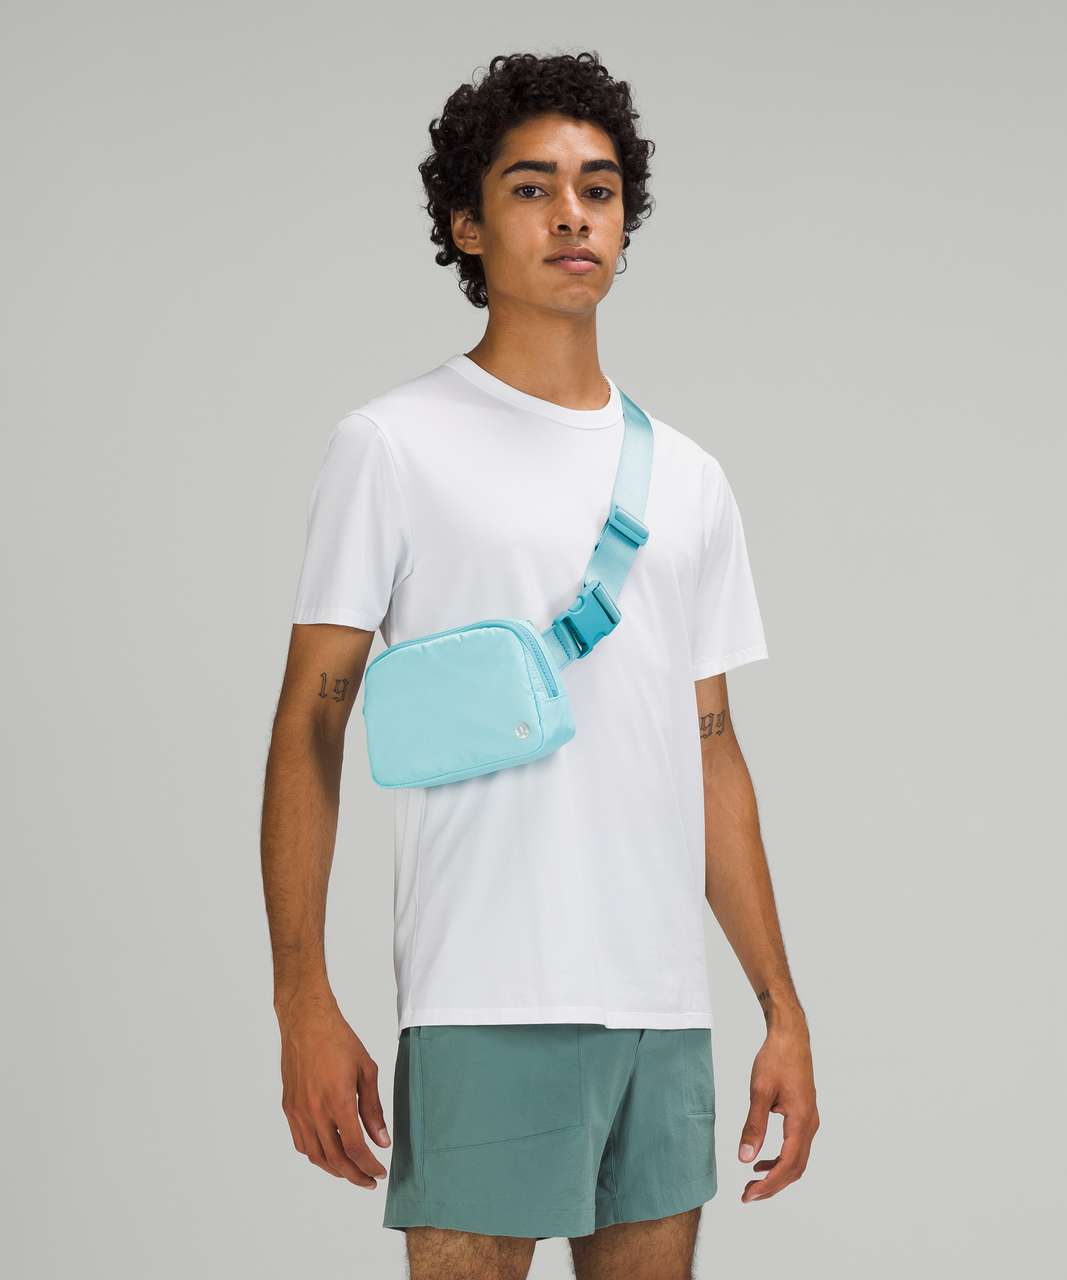 Lululemon Everywhere Belt Bag 1L - Icing Blue / Eton Blue